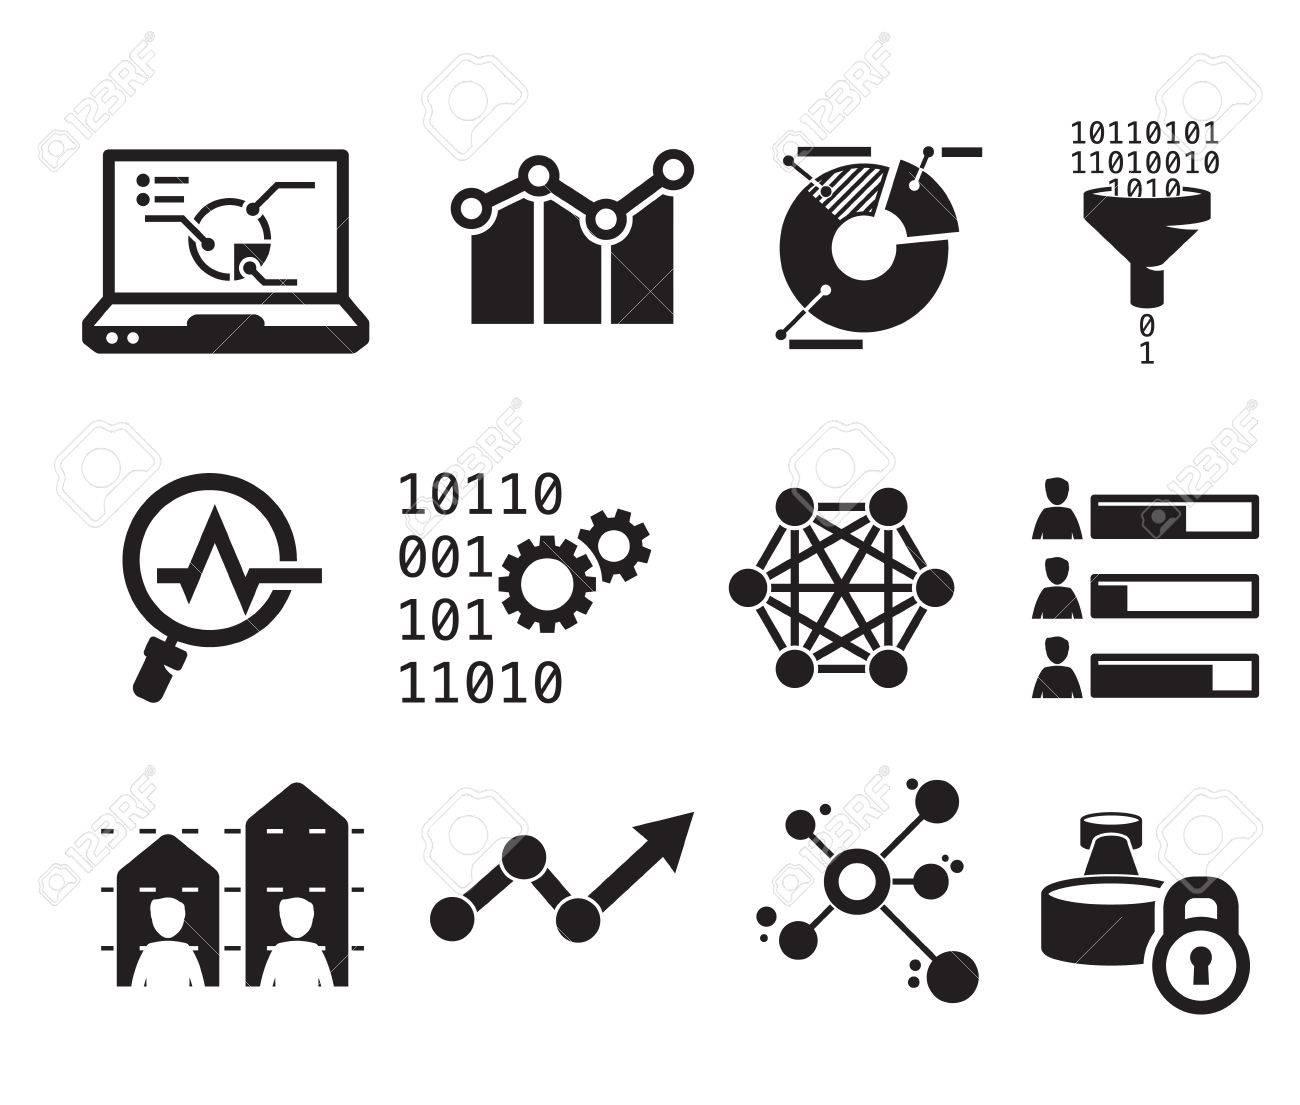 Data analytic icon set BW - 36145535